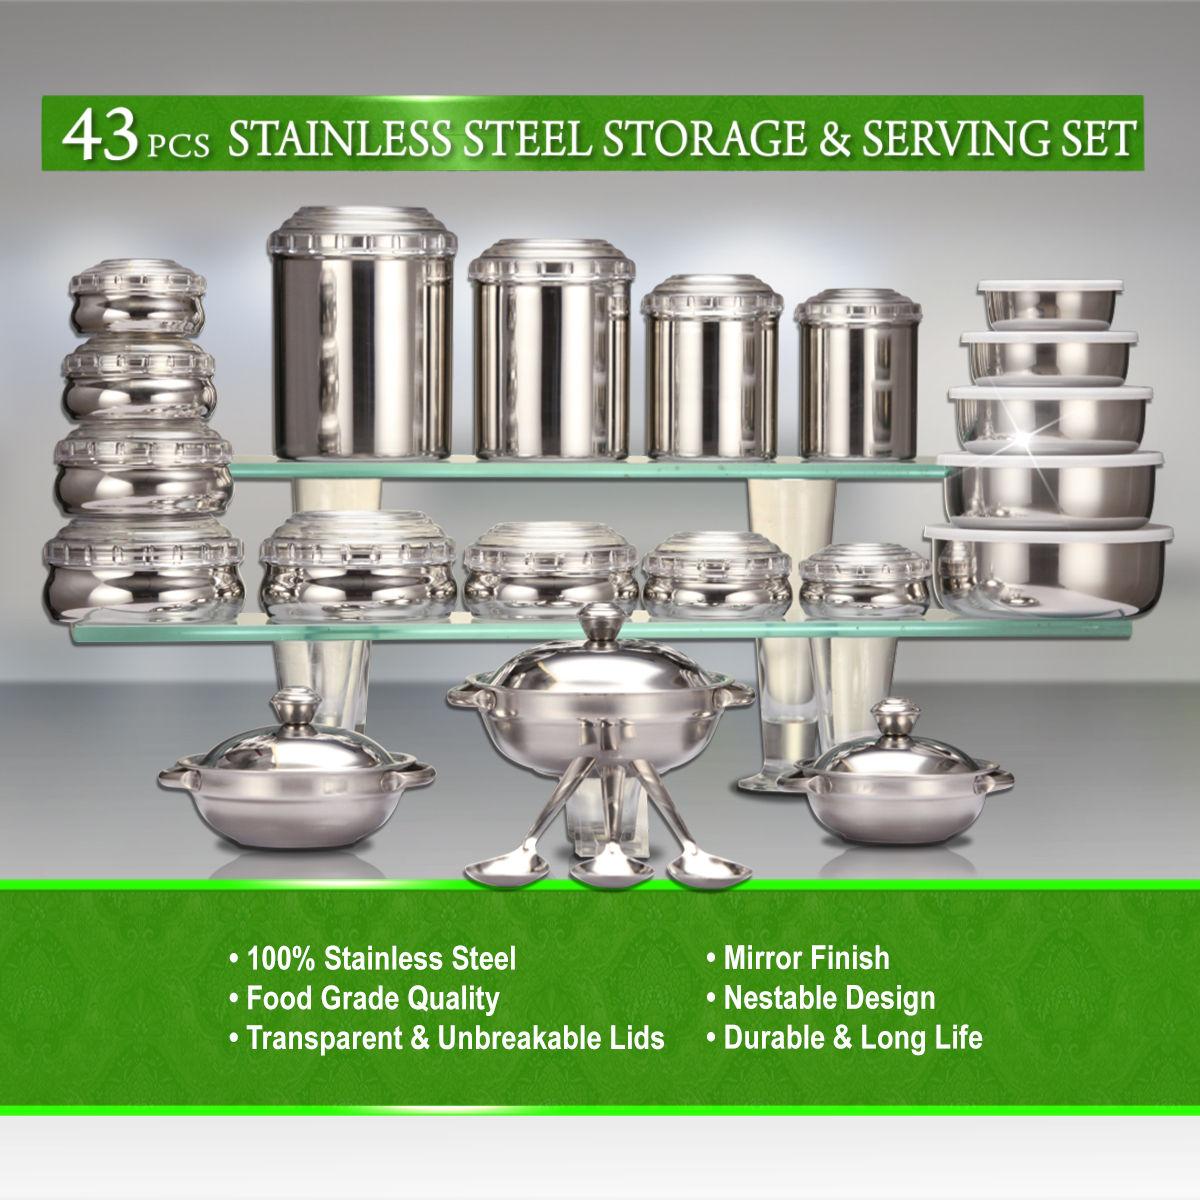 Buy 43 pcs stainless steel storage serving set online at for Naaptol kitchen queen set